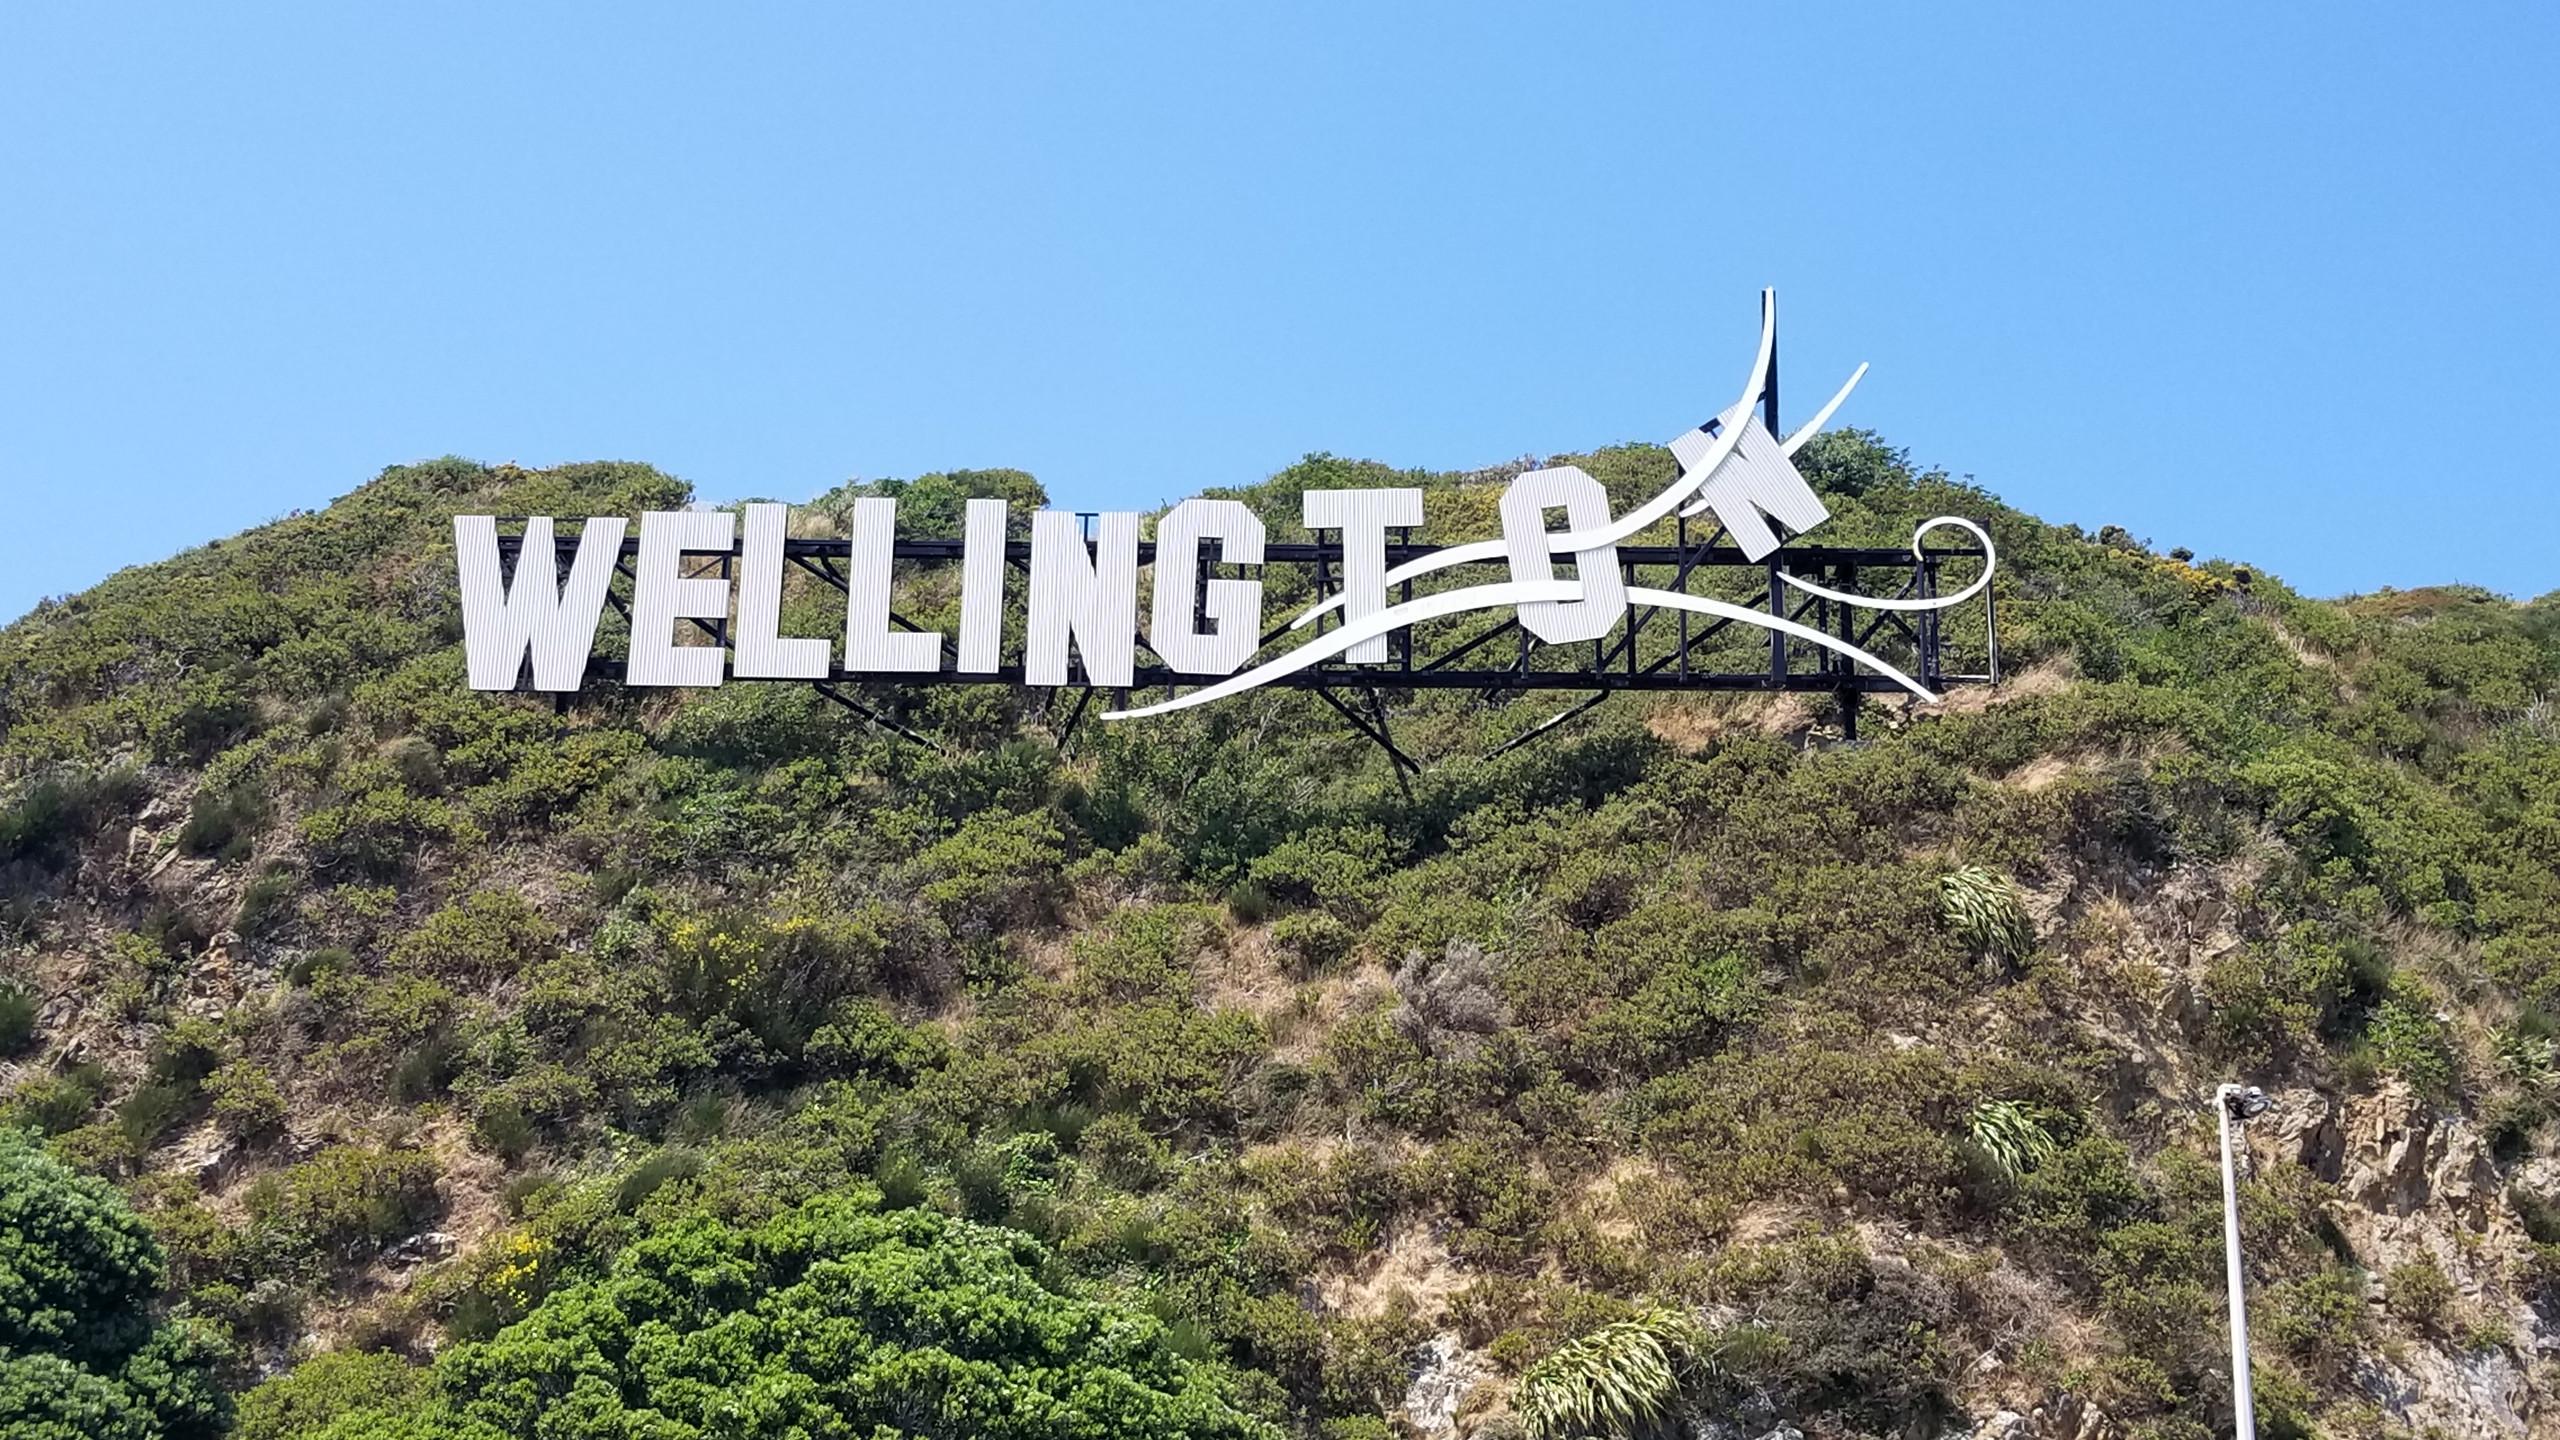 Wellington sign, New Zealand activities, tours of New Zealand